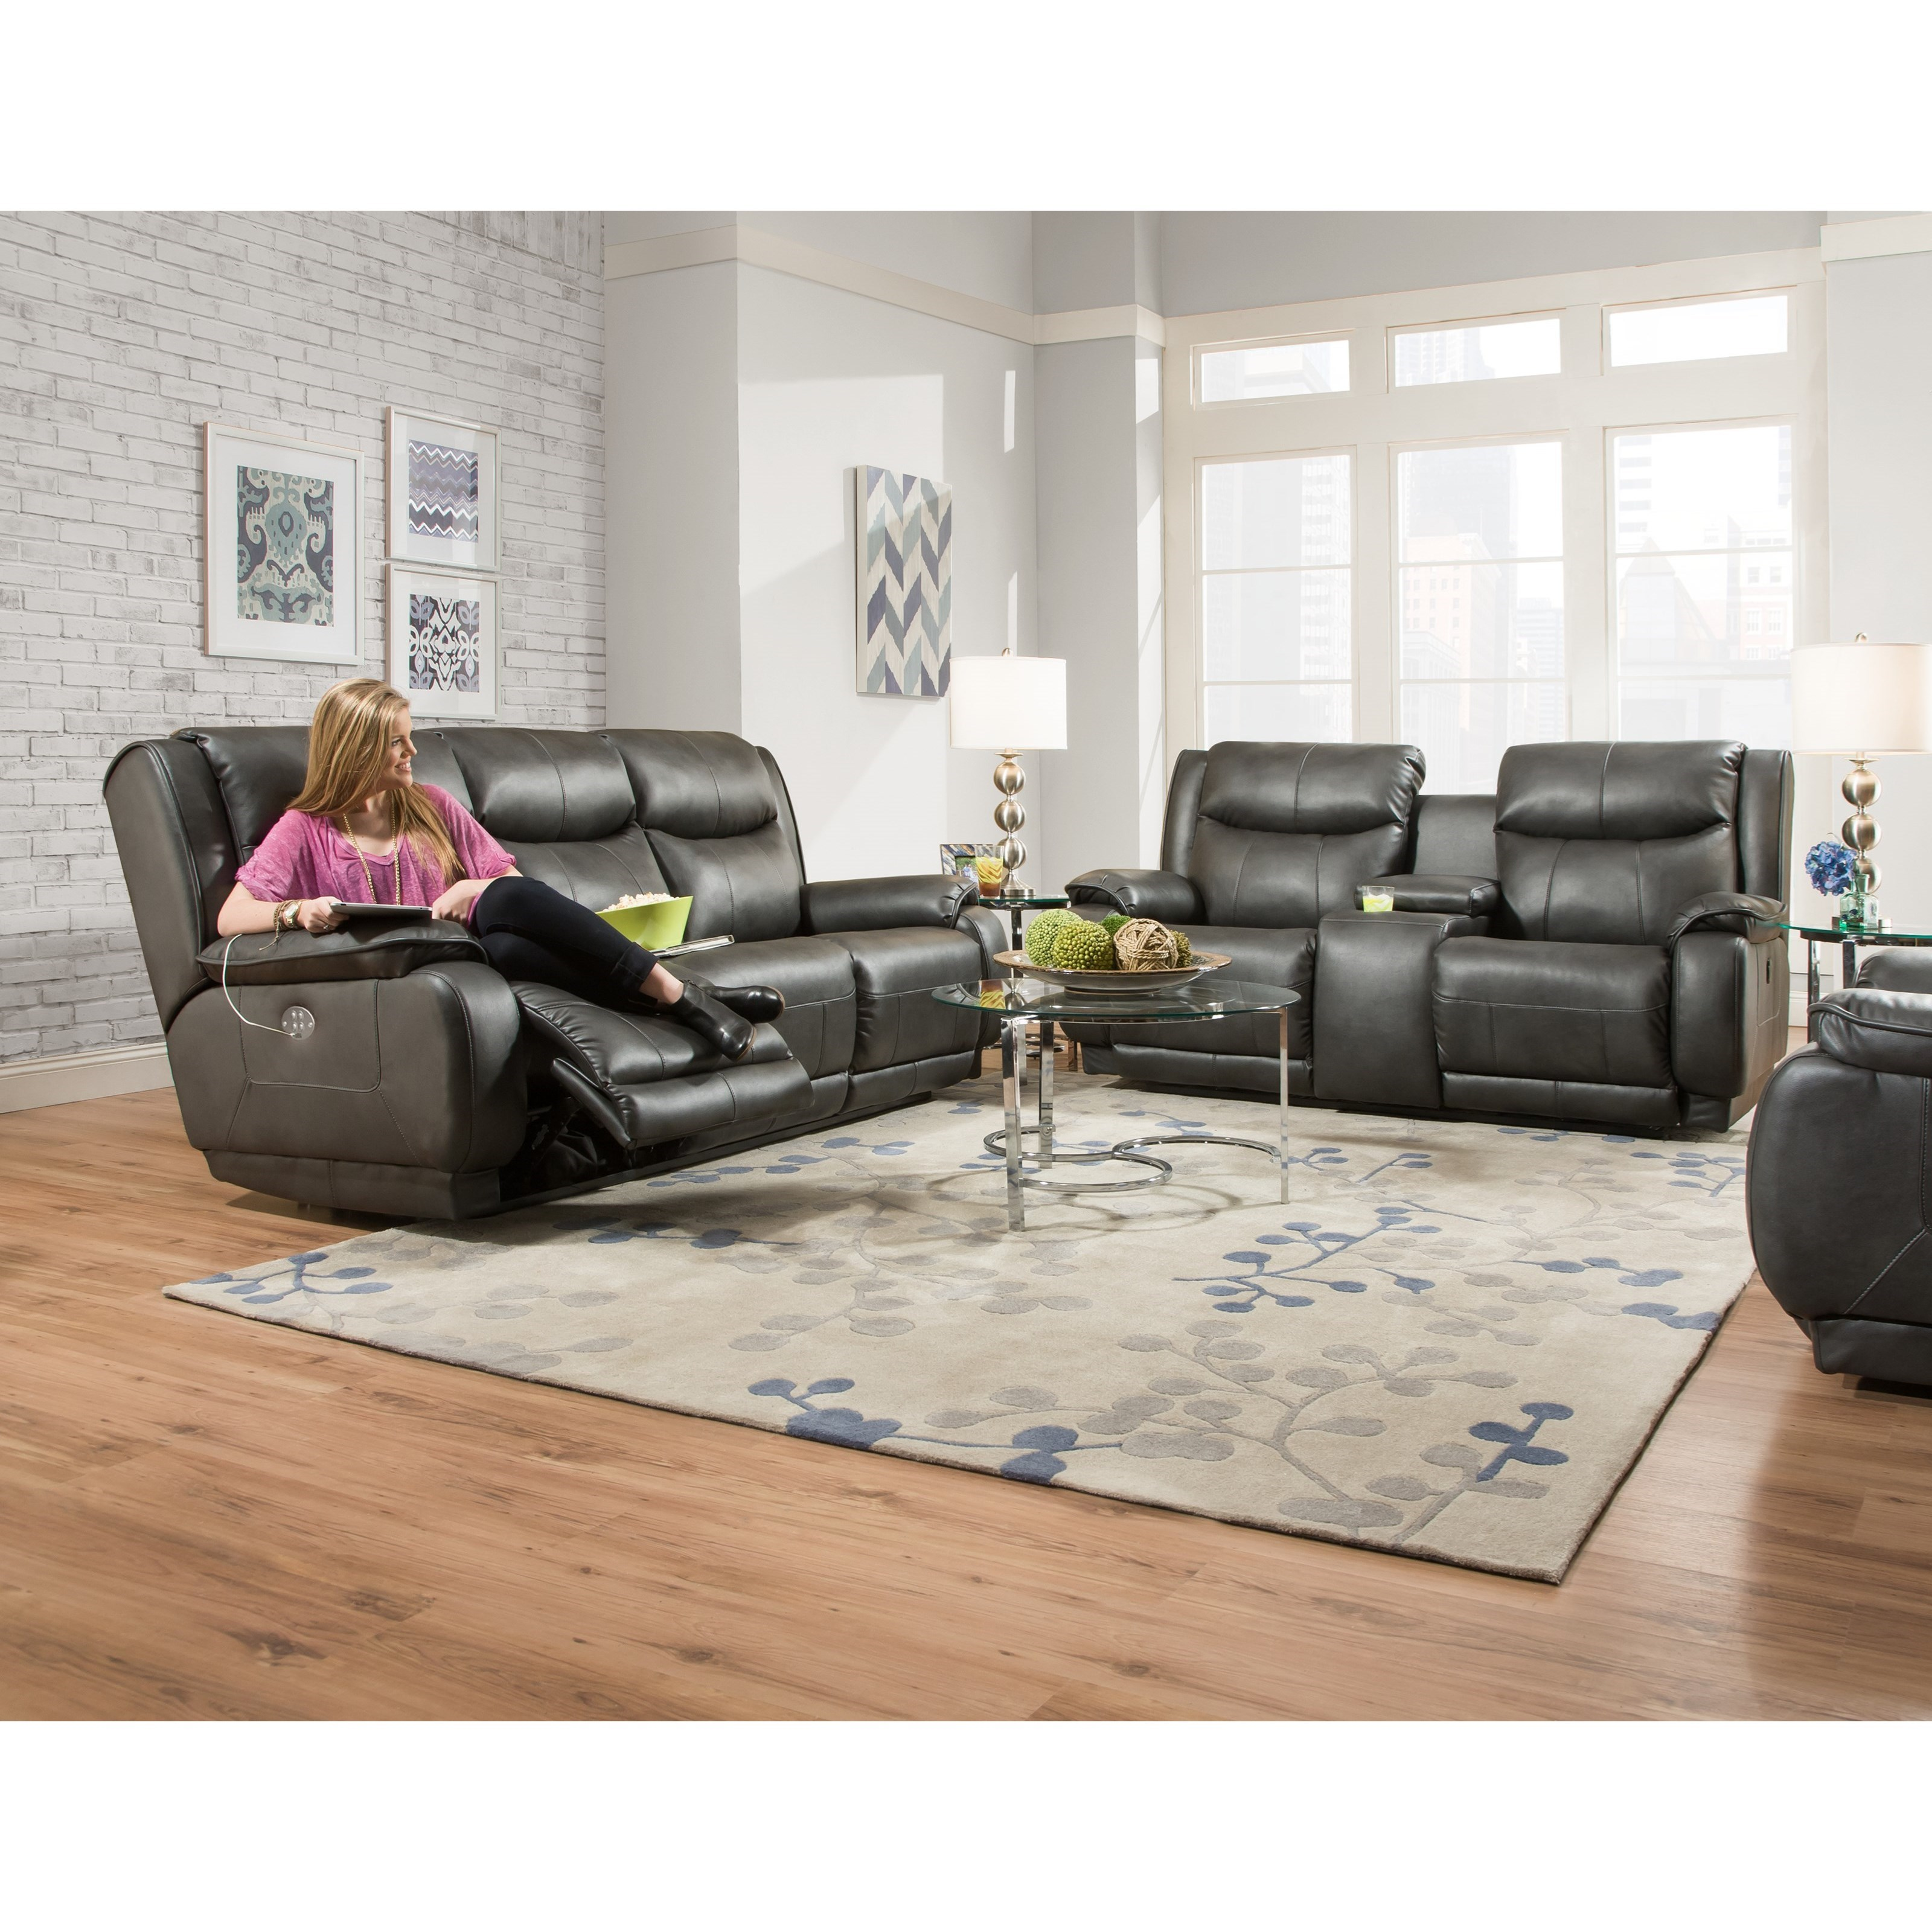 southern motion velocity reclining sofa minimal corner double console